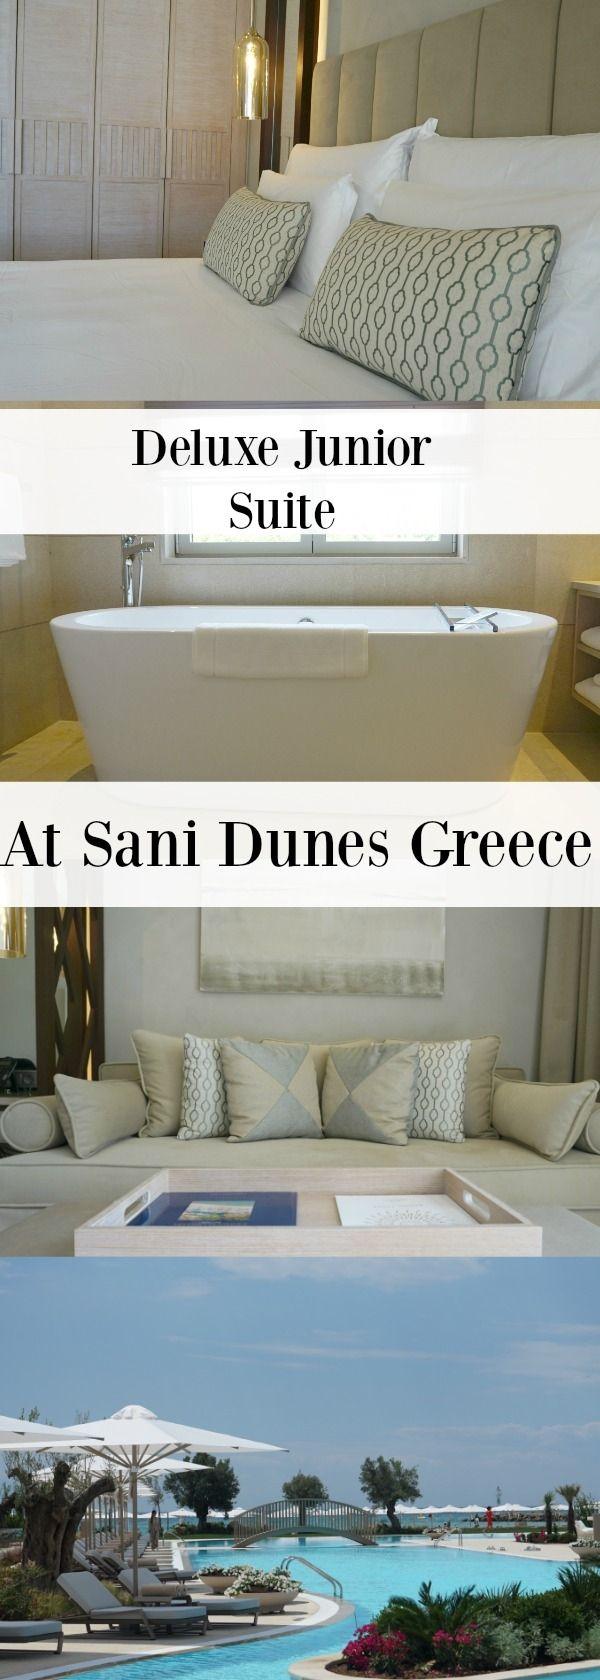 Deluxe Junior Suite At Sani Dunes Luxury Resort Halkidiki Greece